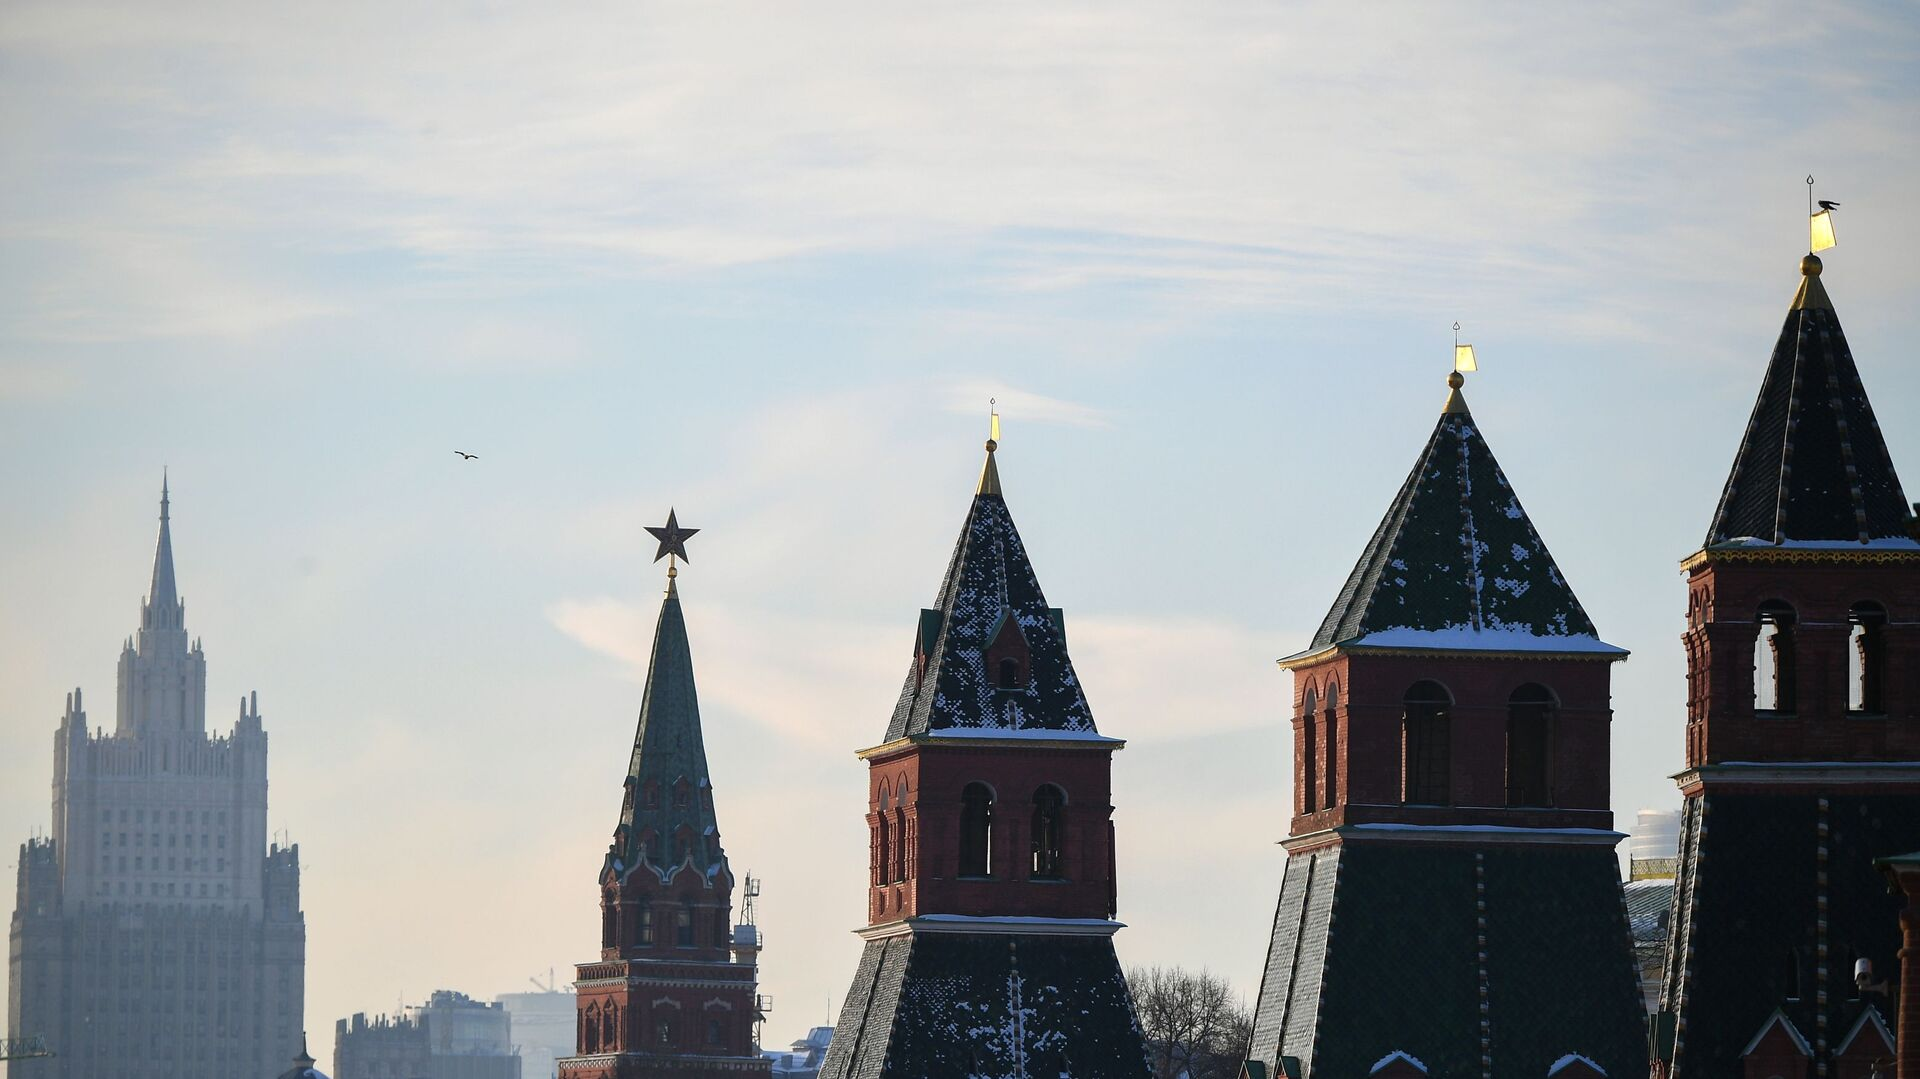 El Kremlin de Moscú, Rusia - Sputnik Mundo, 1920, 09.03.2021